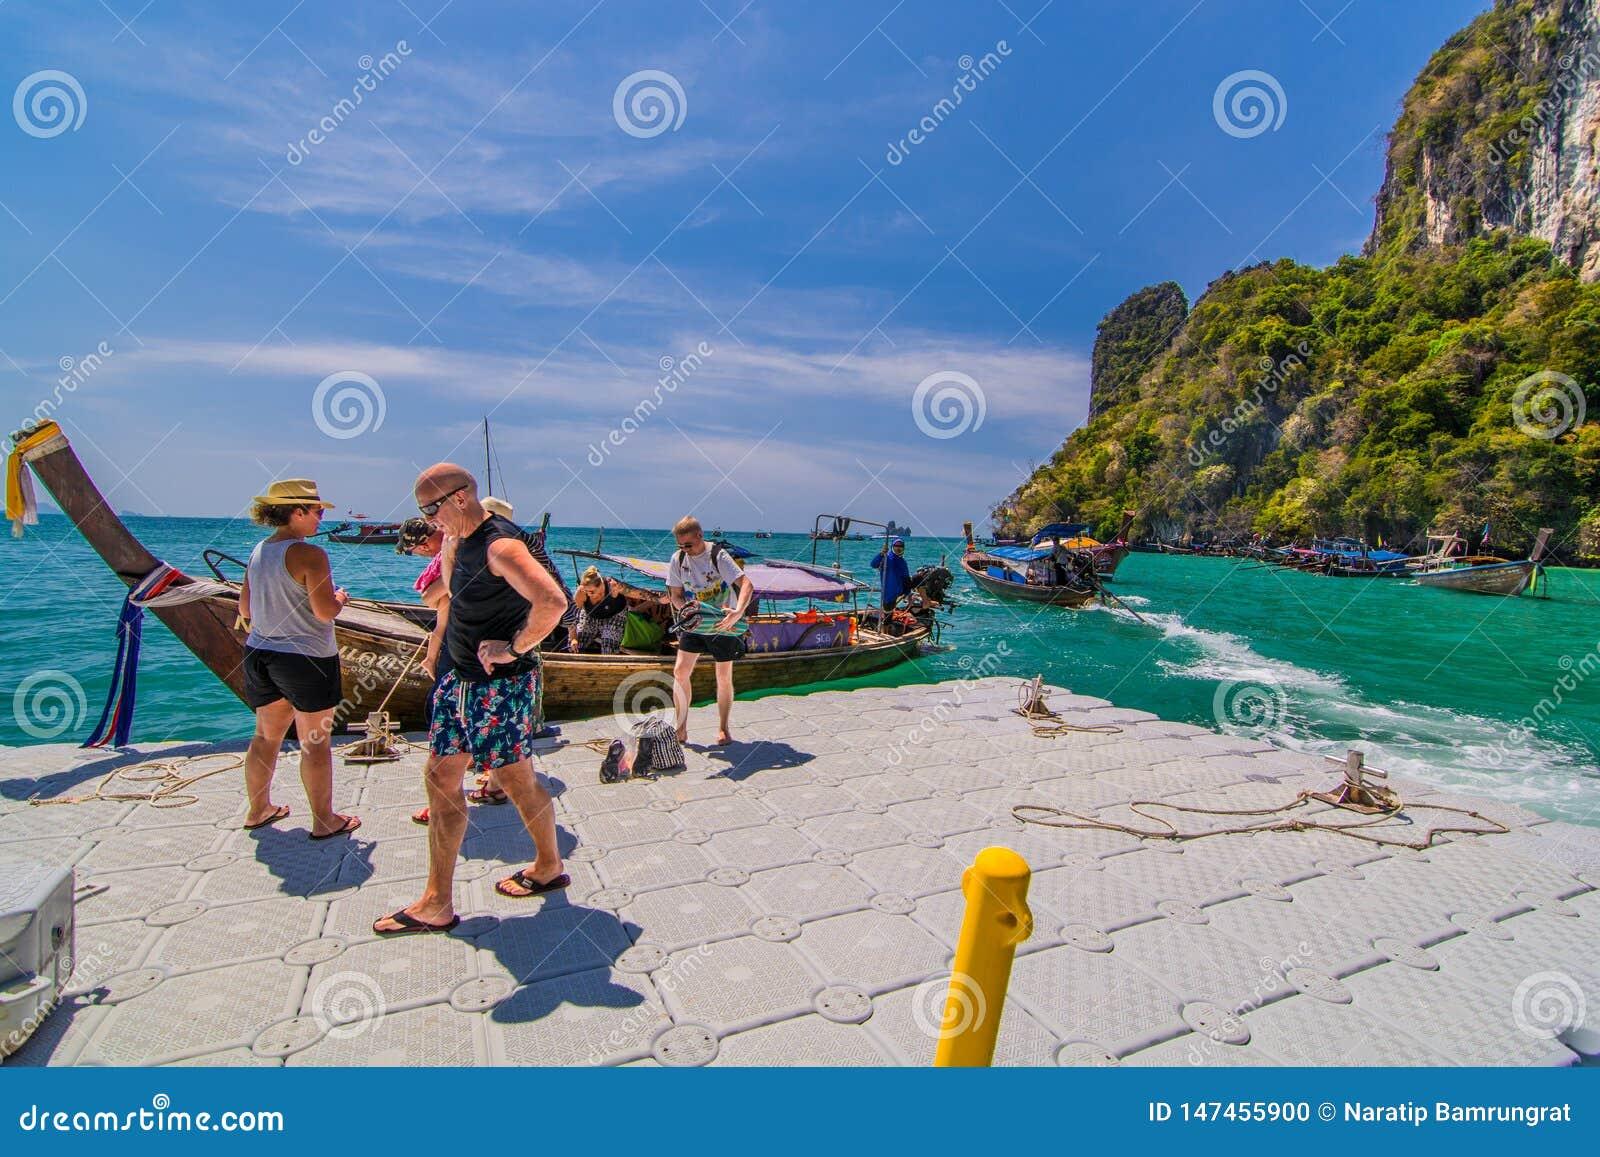 Krabi Thailand February 23 2019 Many Tourists Walking On A